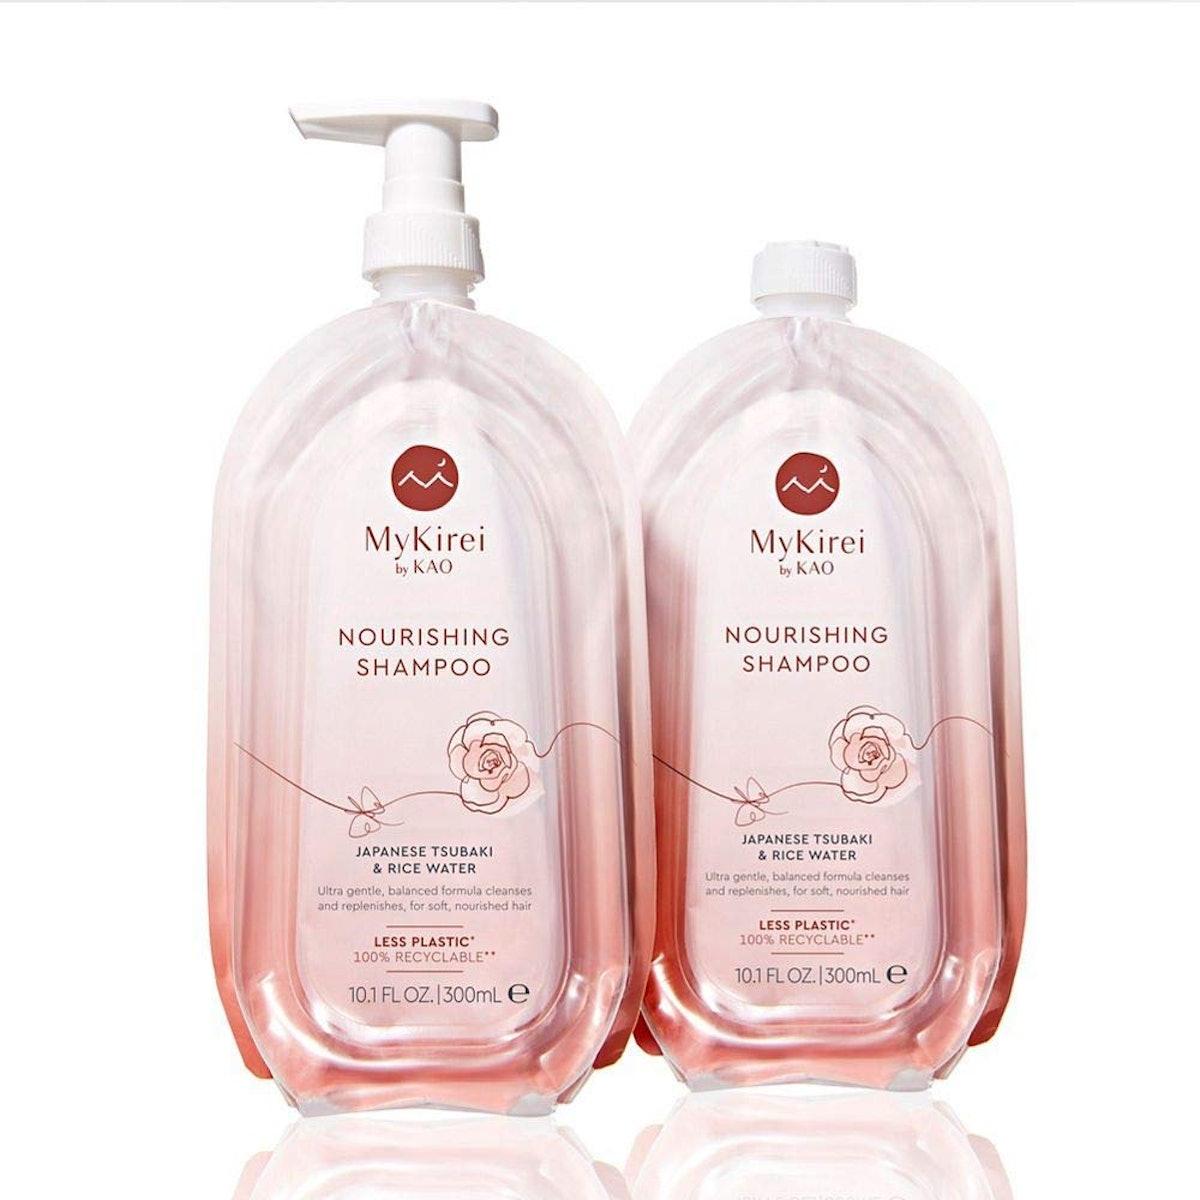 MyKirei By Kao Nourishing Shampoo